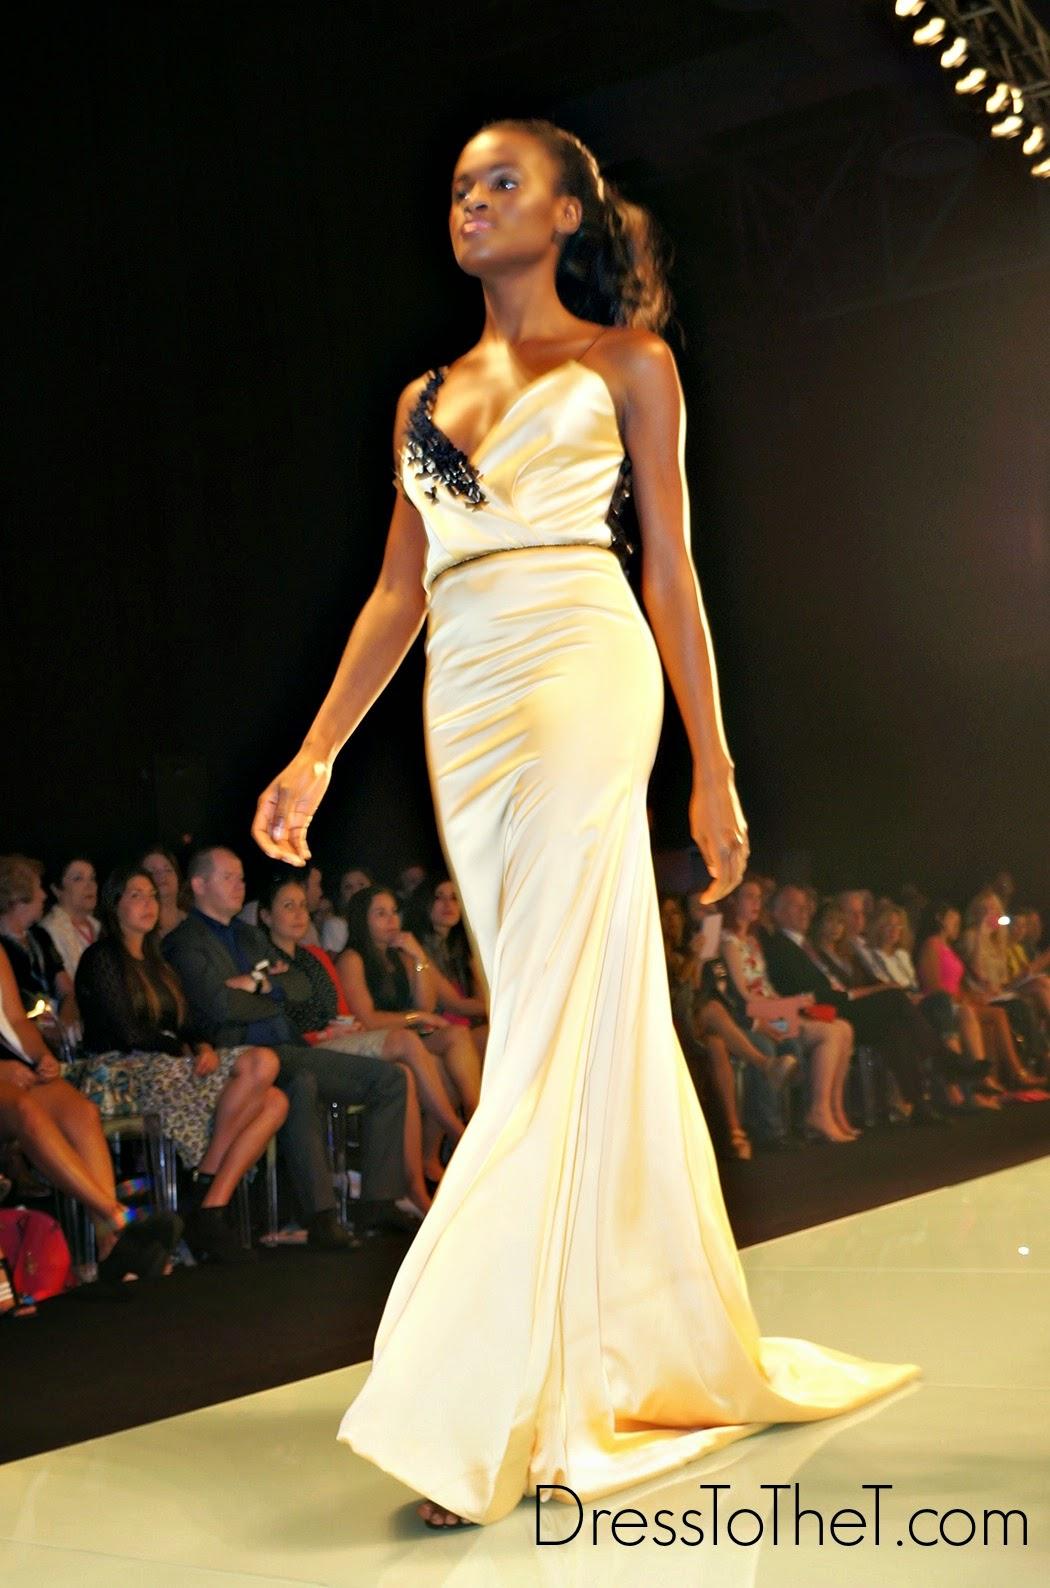 Fashion: The Best of Miami Fashion Week 2014 Magnolia7